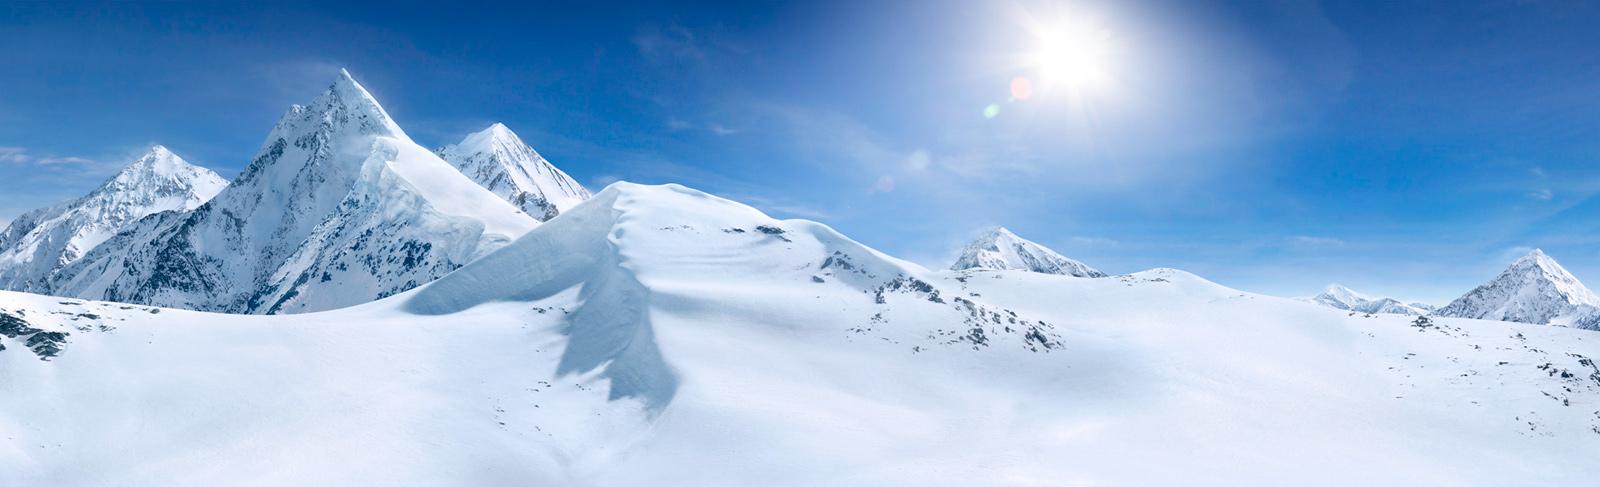 Coors-Mountain-Range-copy.jpg